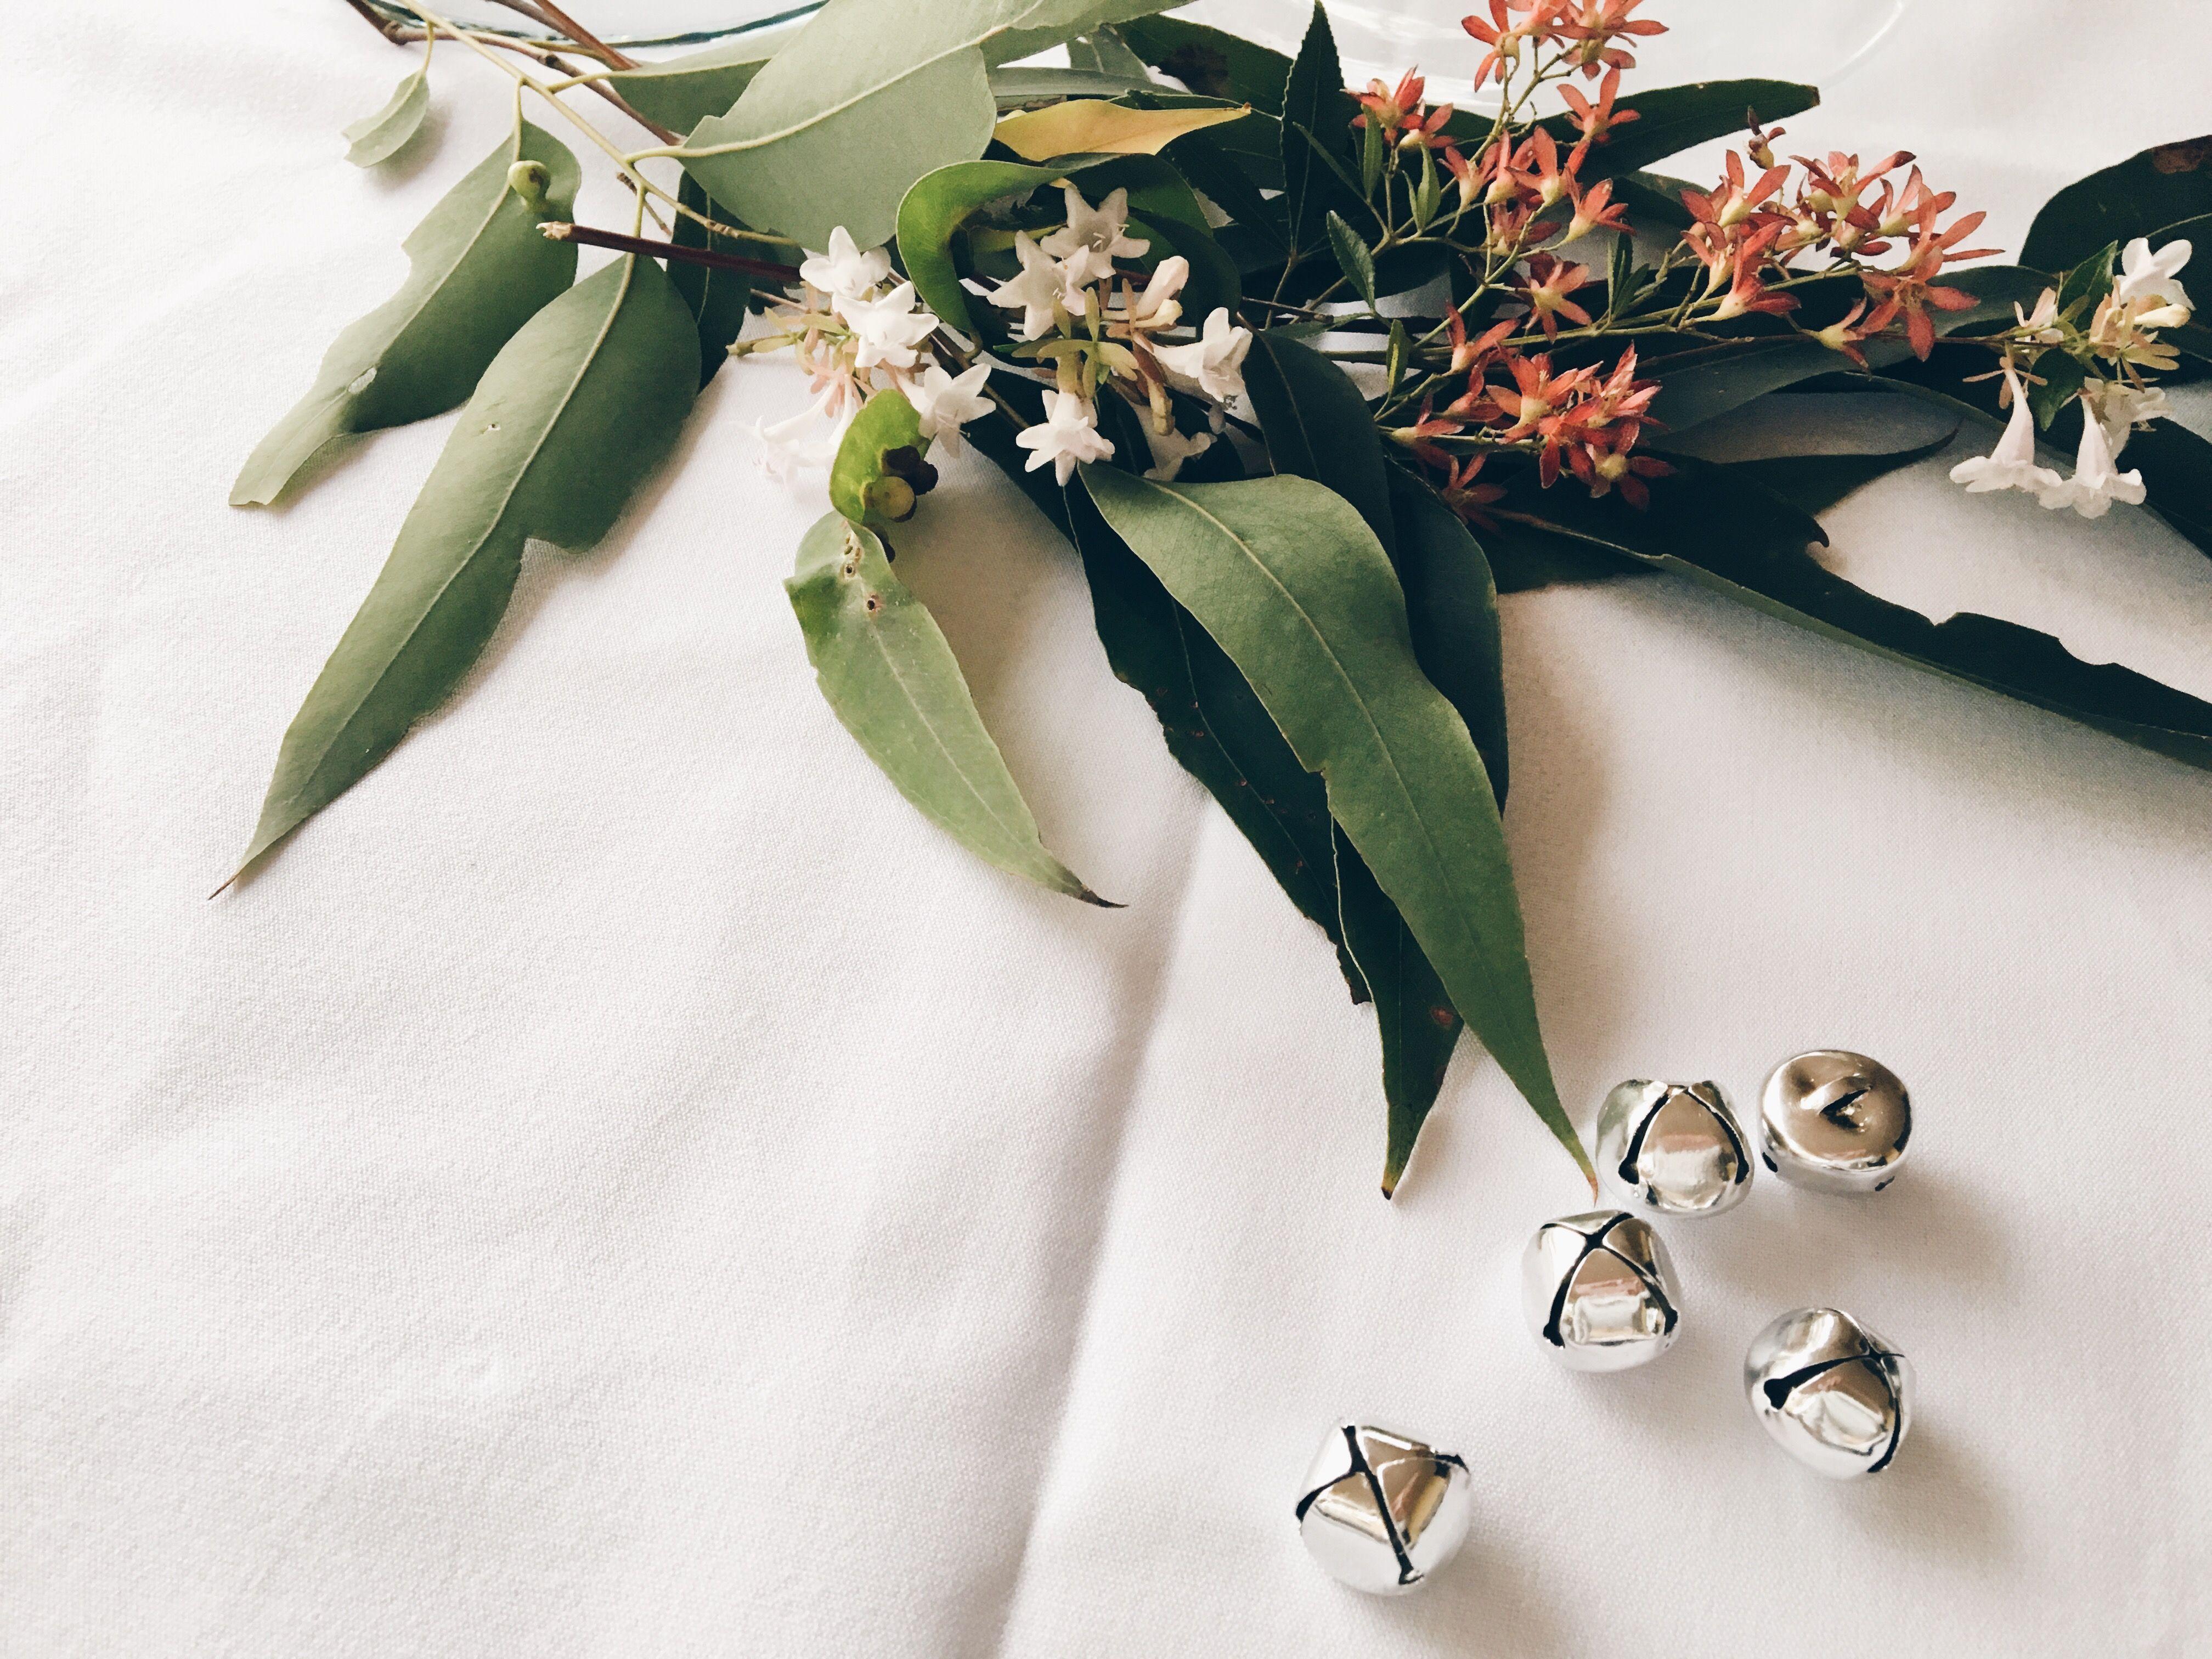 Australian Christmas floral table arrangement. Eucalyptus